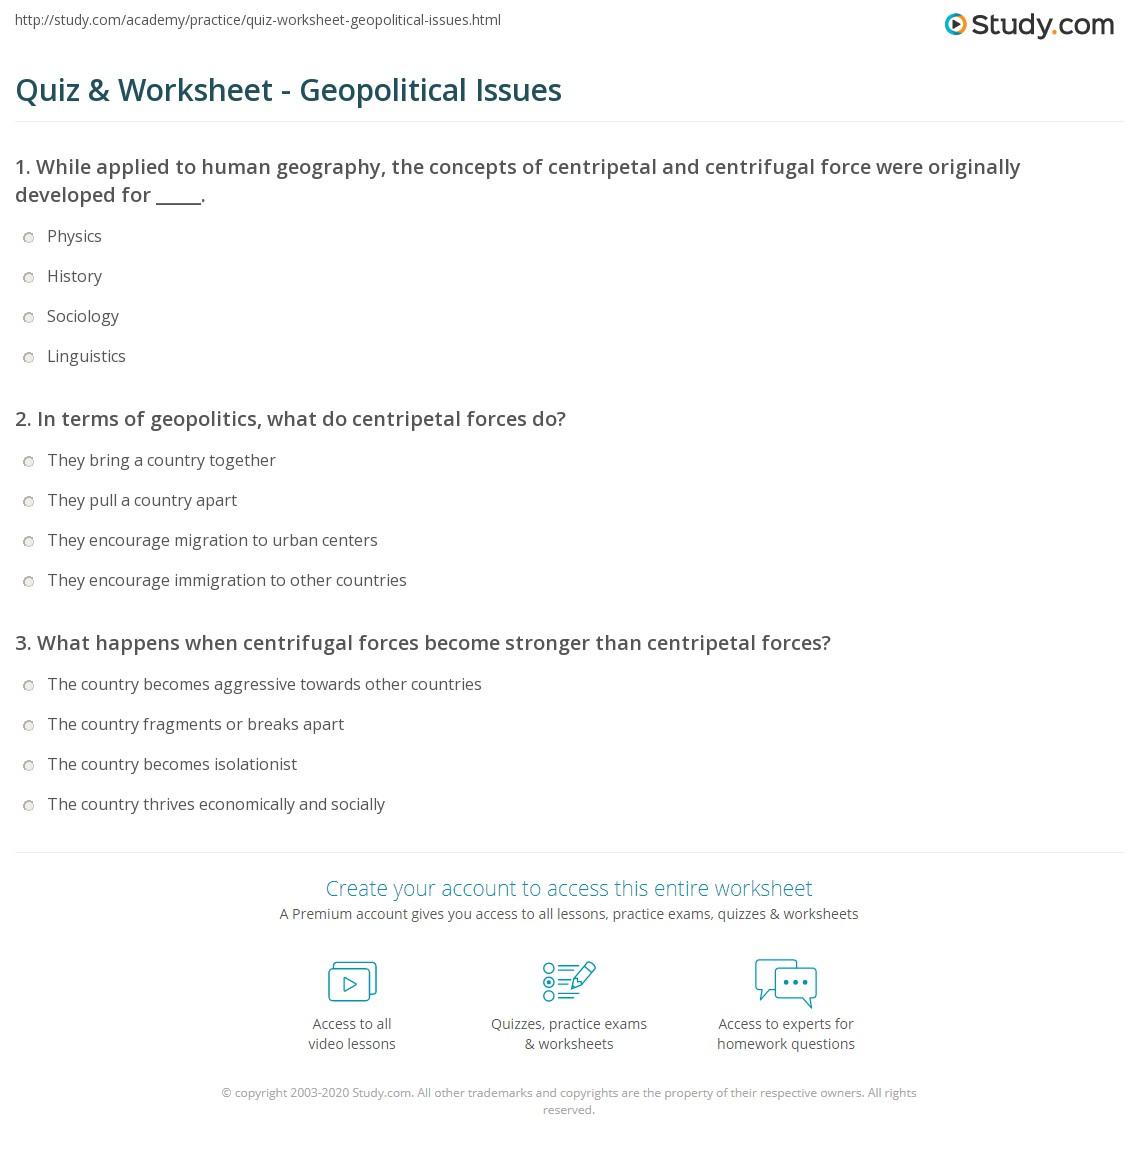 Worksheets Centripetal Force Worksheet quiz worksheet geopolitical issues study com print centripetal centrifugal forces in geopolitics worksheet